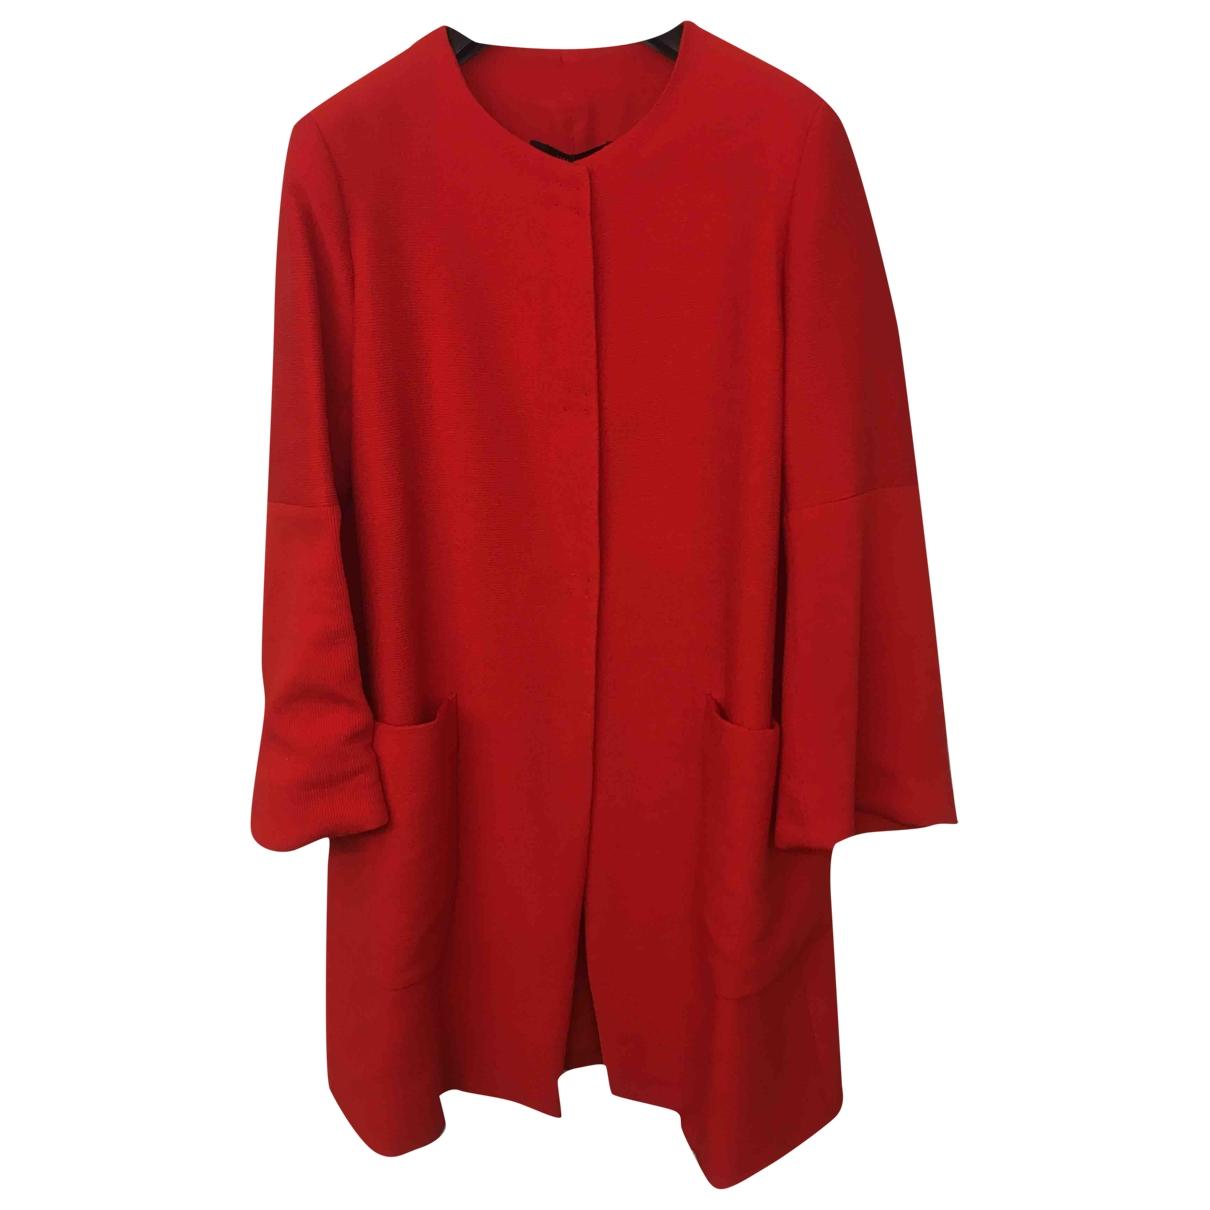 Zara \N Red jacket for Women M International